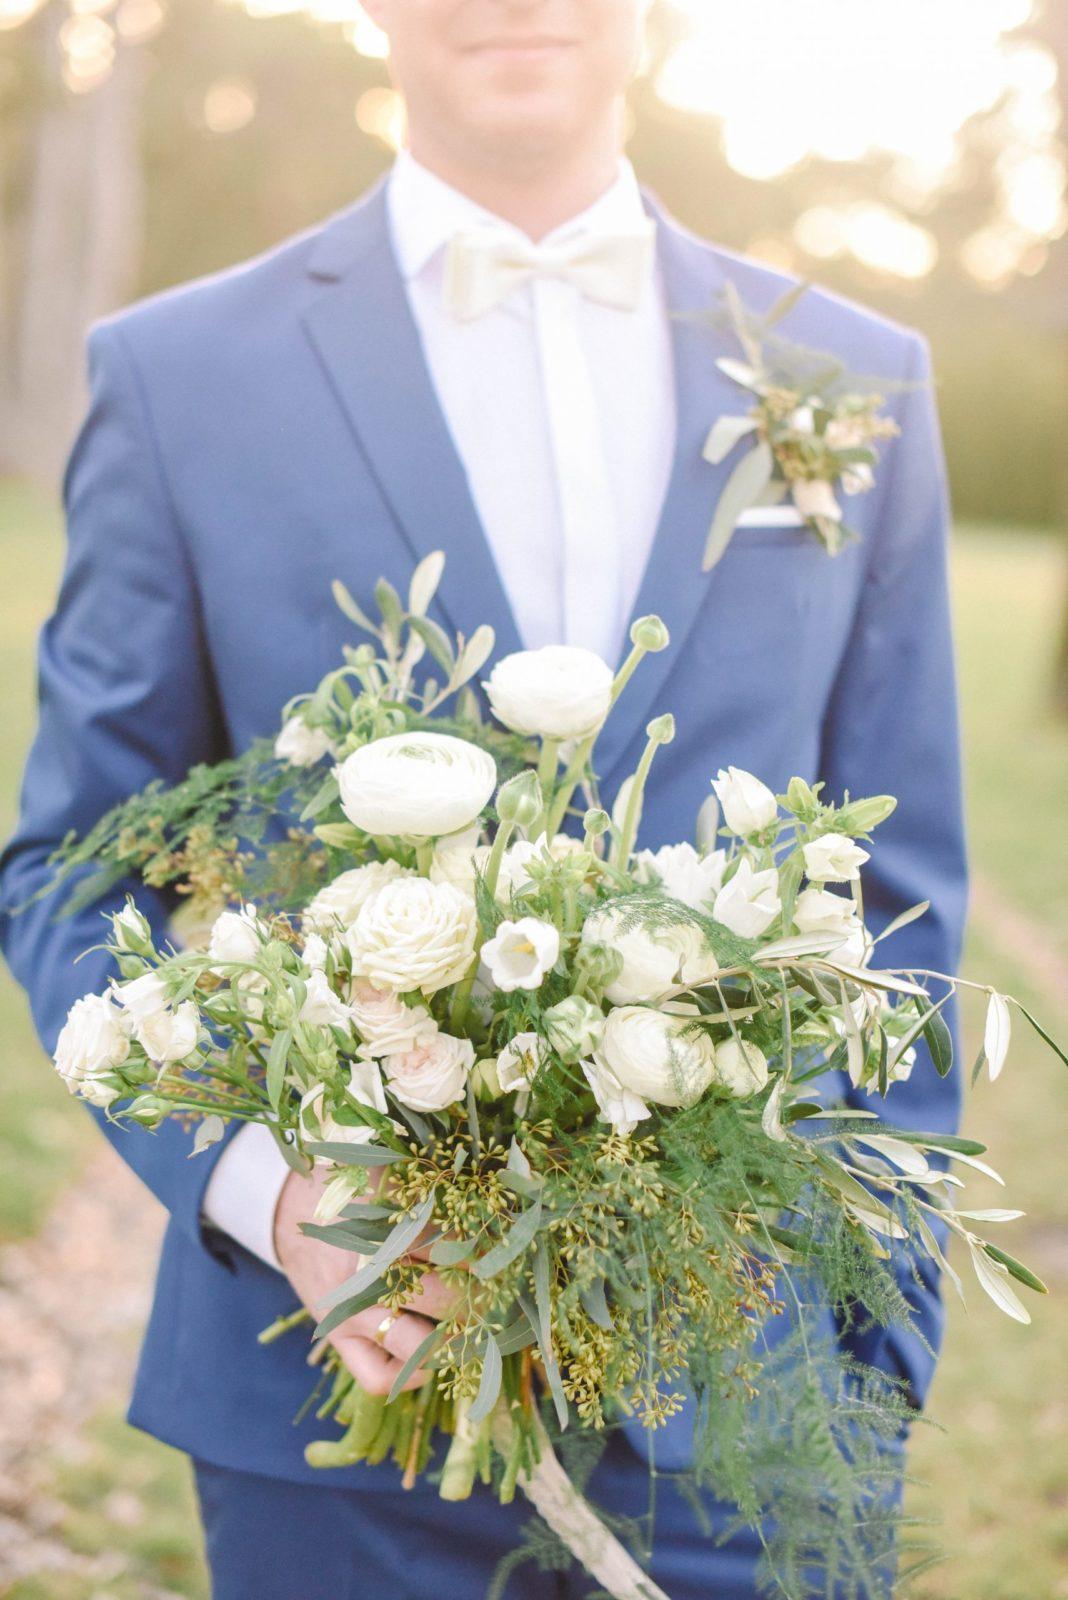 Ženích drží svadobnú kyticu.